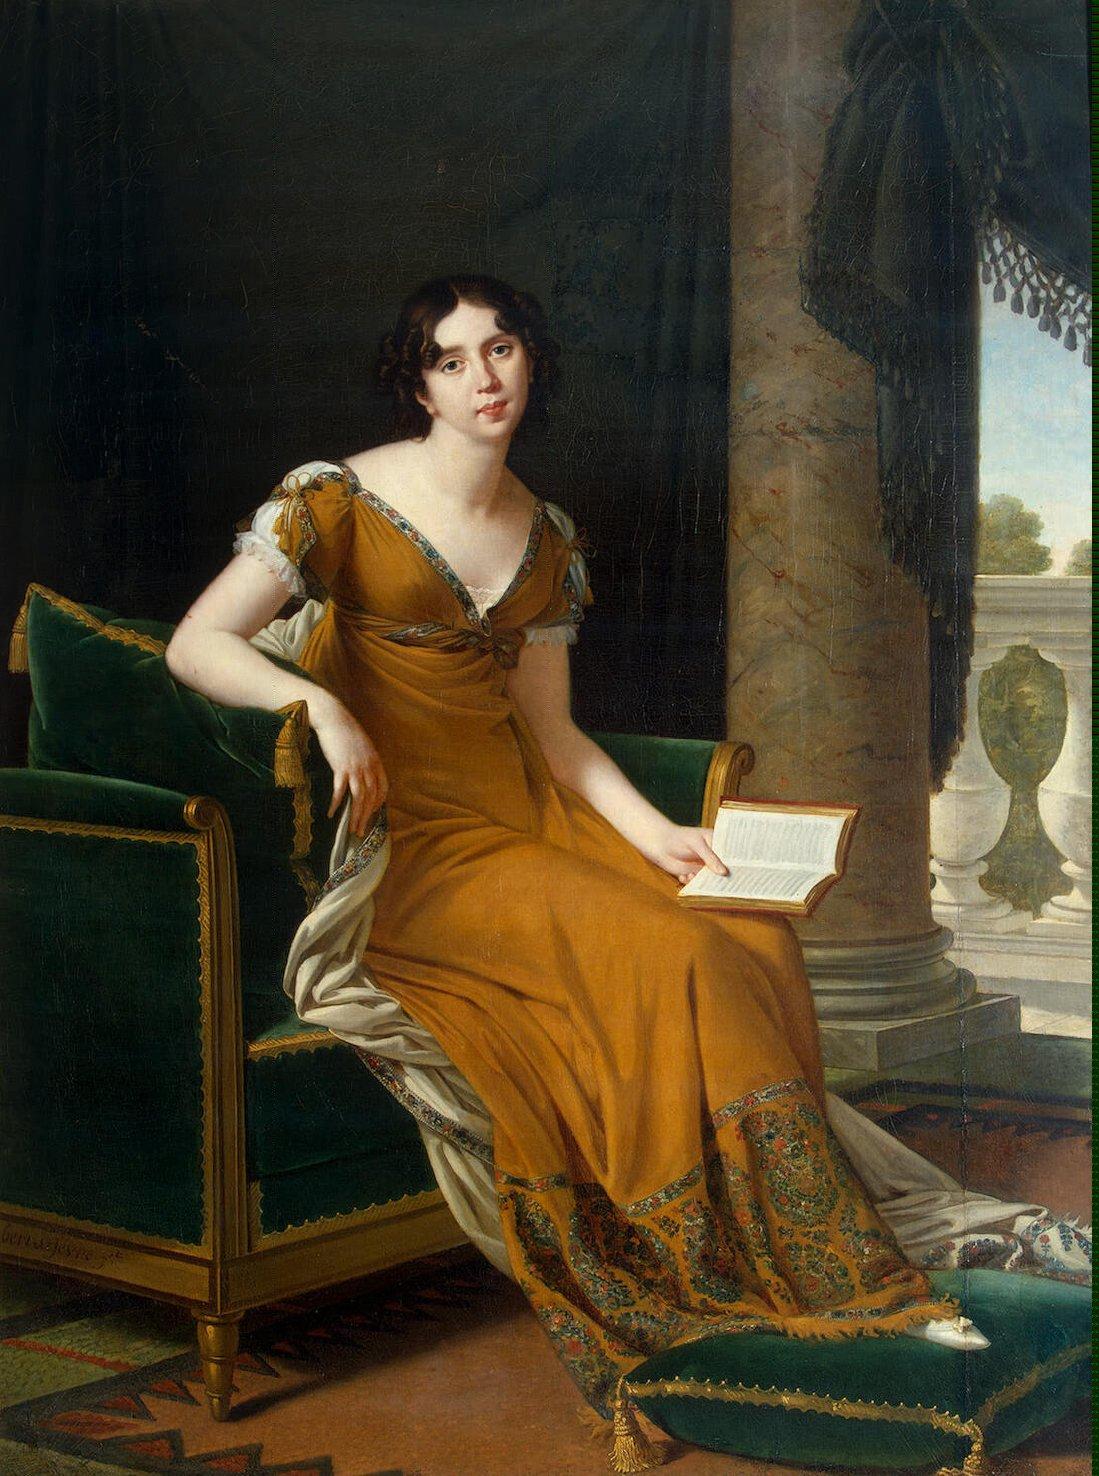 Robert Lefèvre Elisabeth Stroganoff, comtesse Demidoff